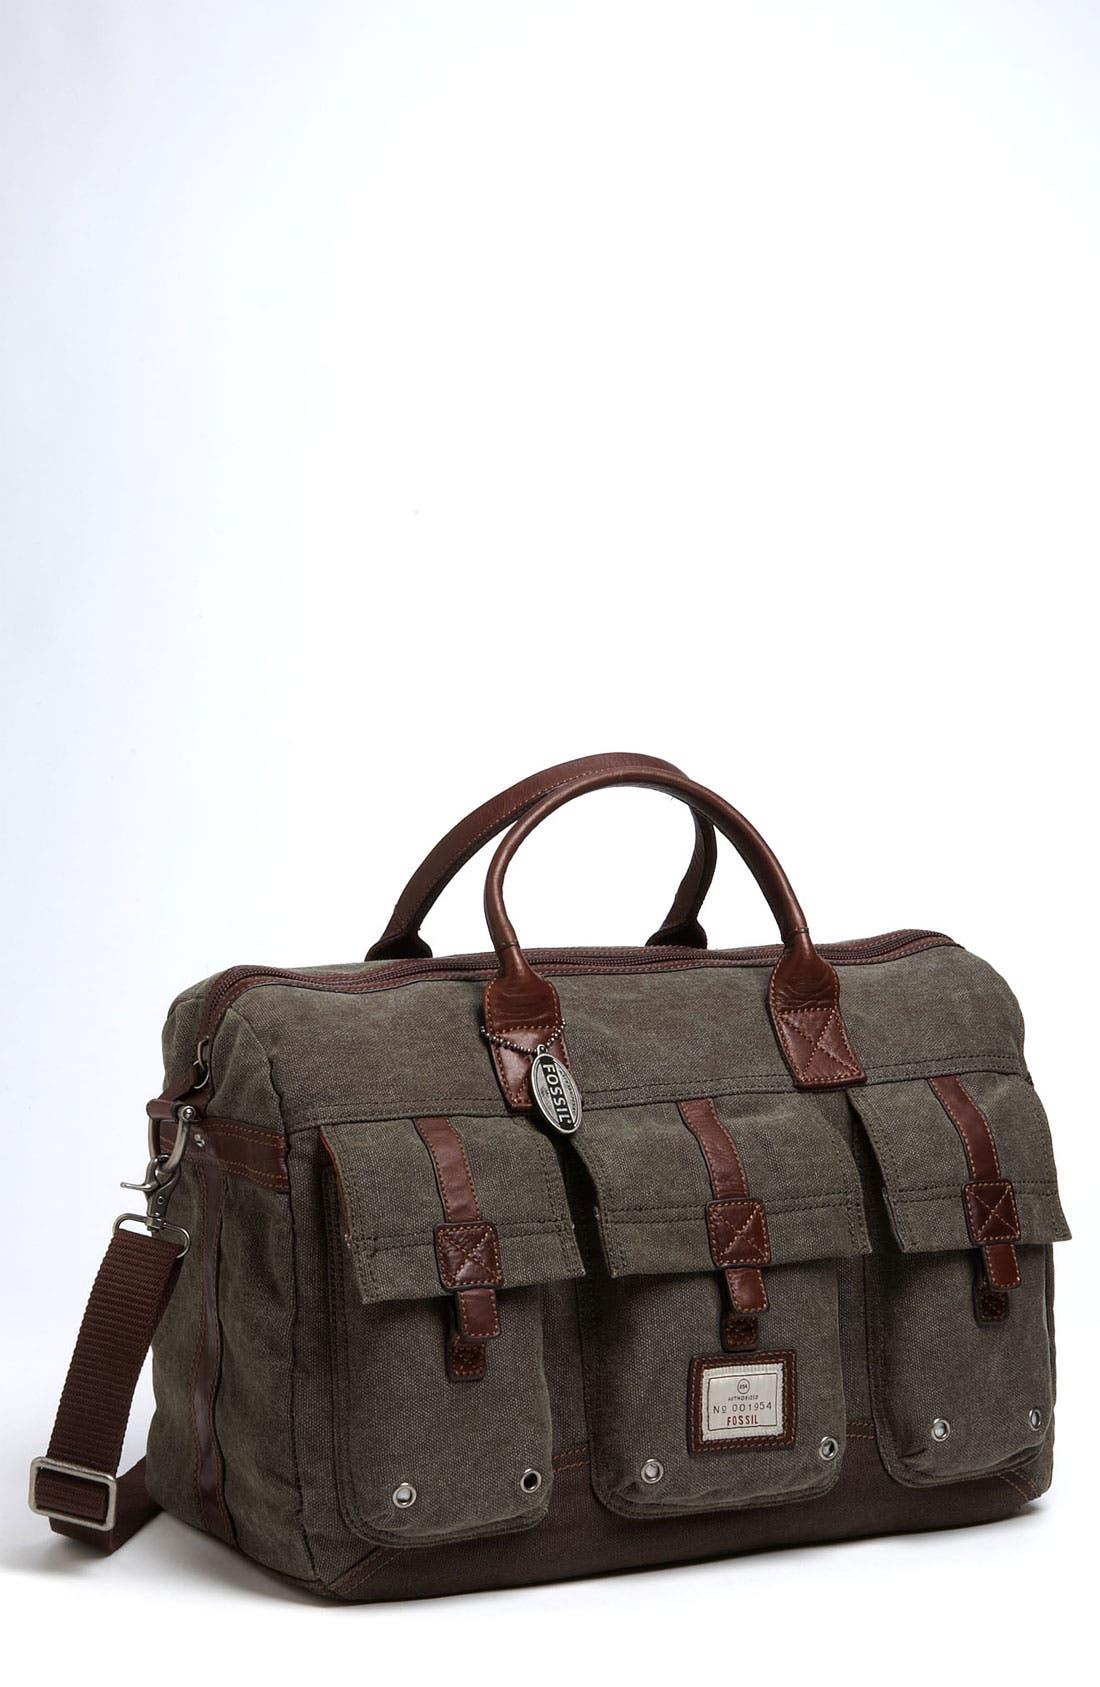 Main Image - Fossil 'Trail' Duffel Bag